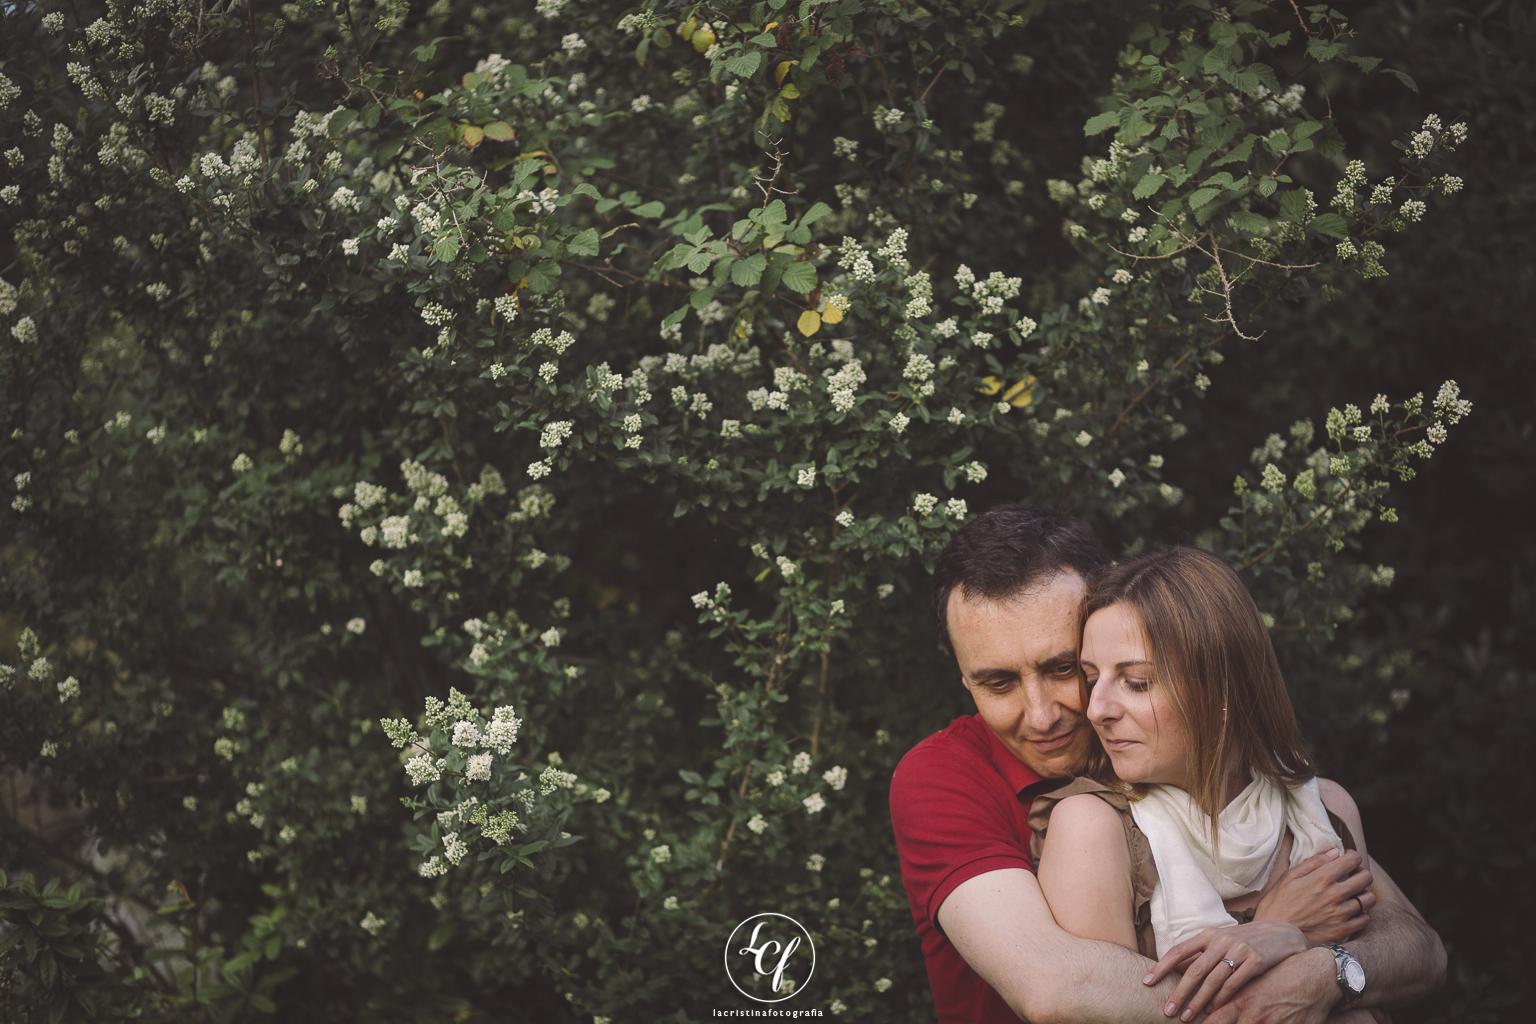 Fotografo de preboda :: Fotografía de preboda :: Fotógrafo de pareja :: Fotógrafía de pareja